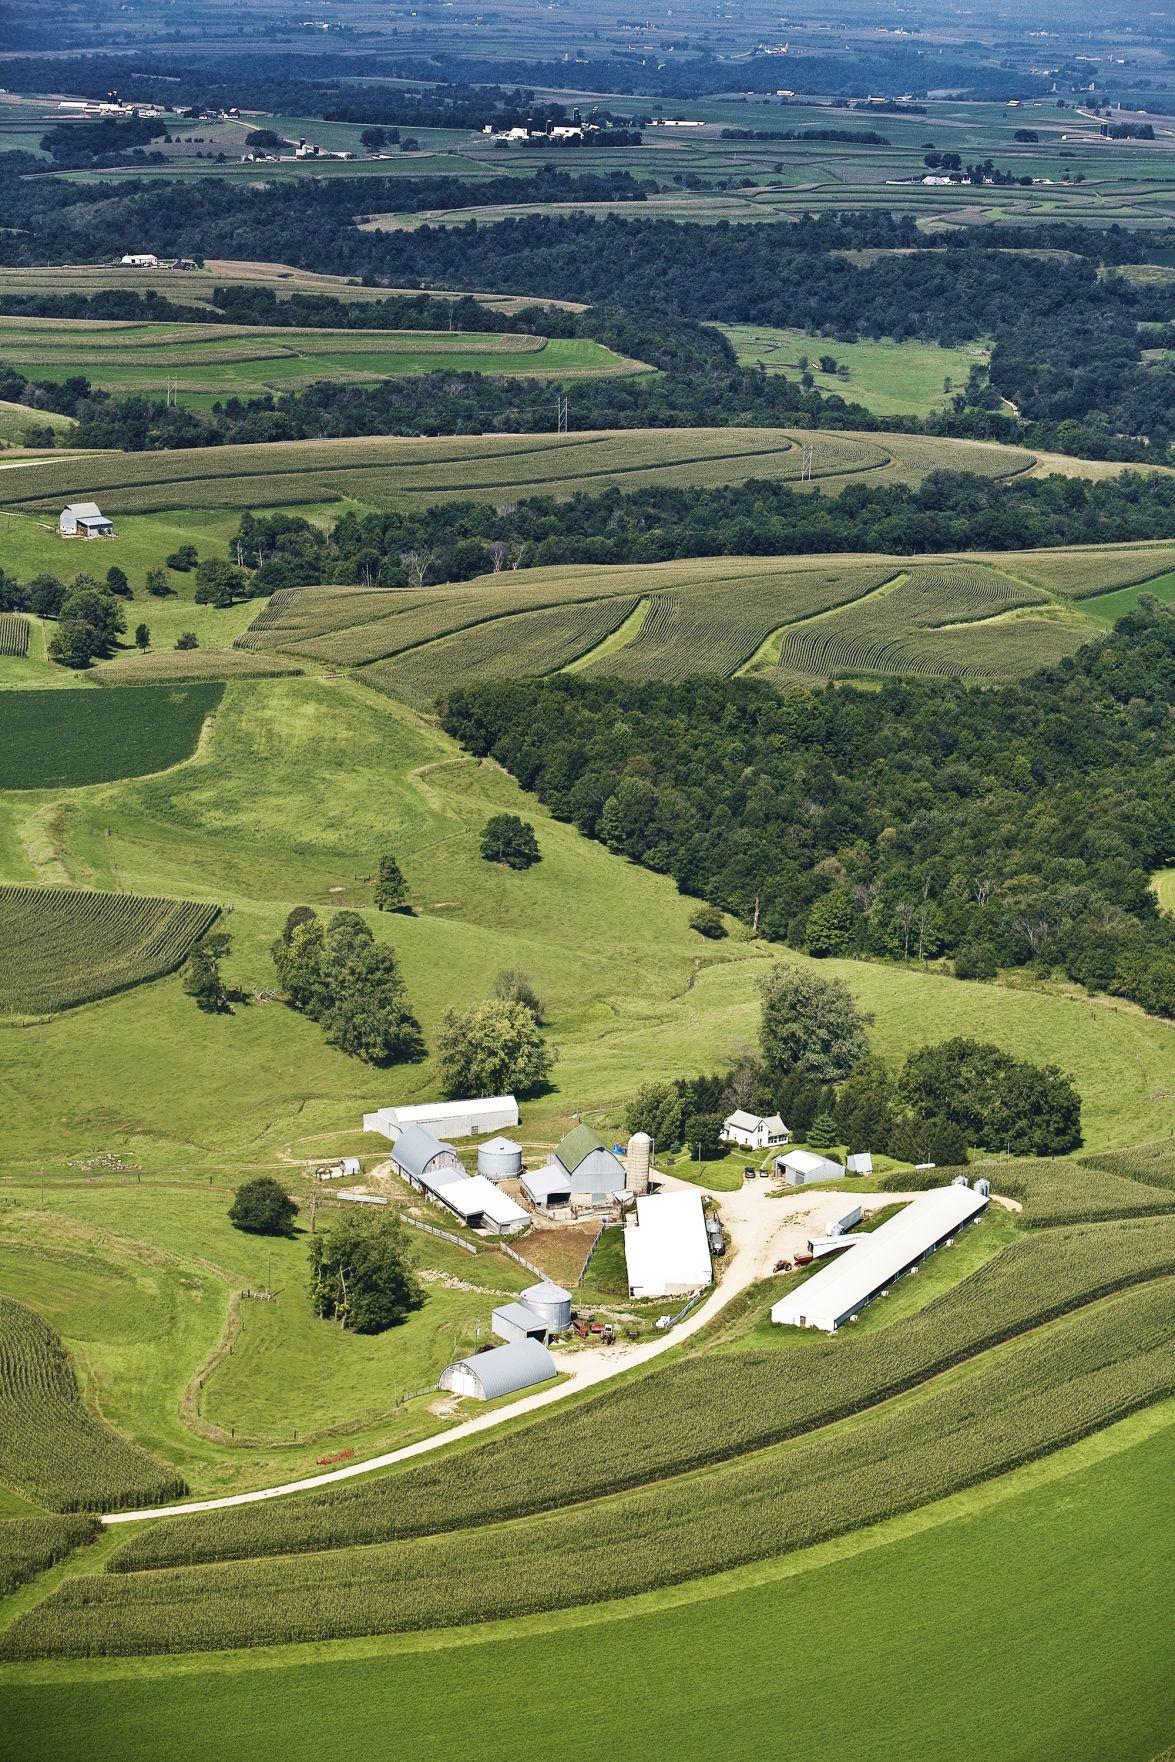 Farmland values decrease